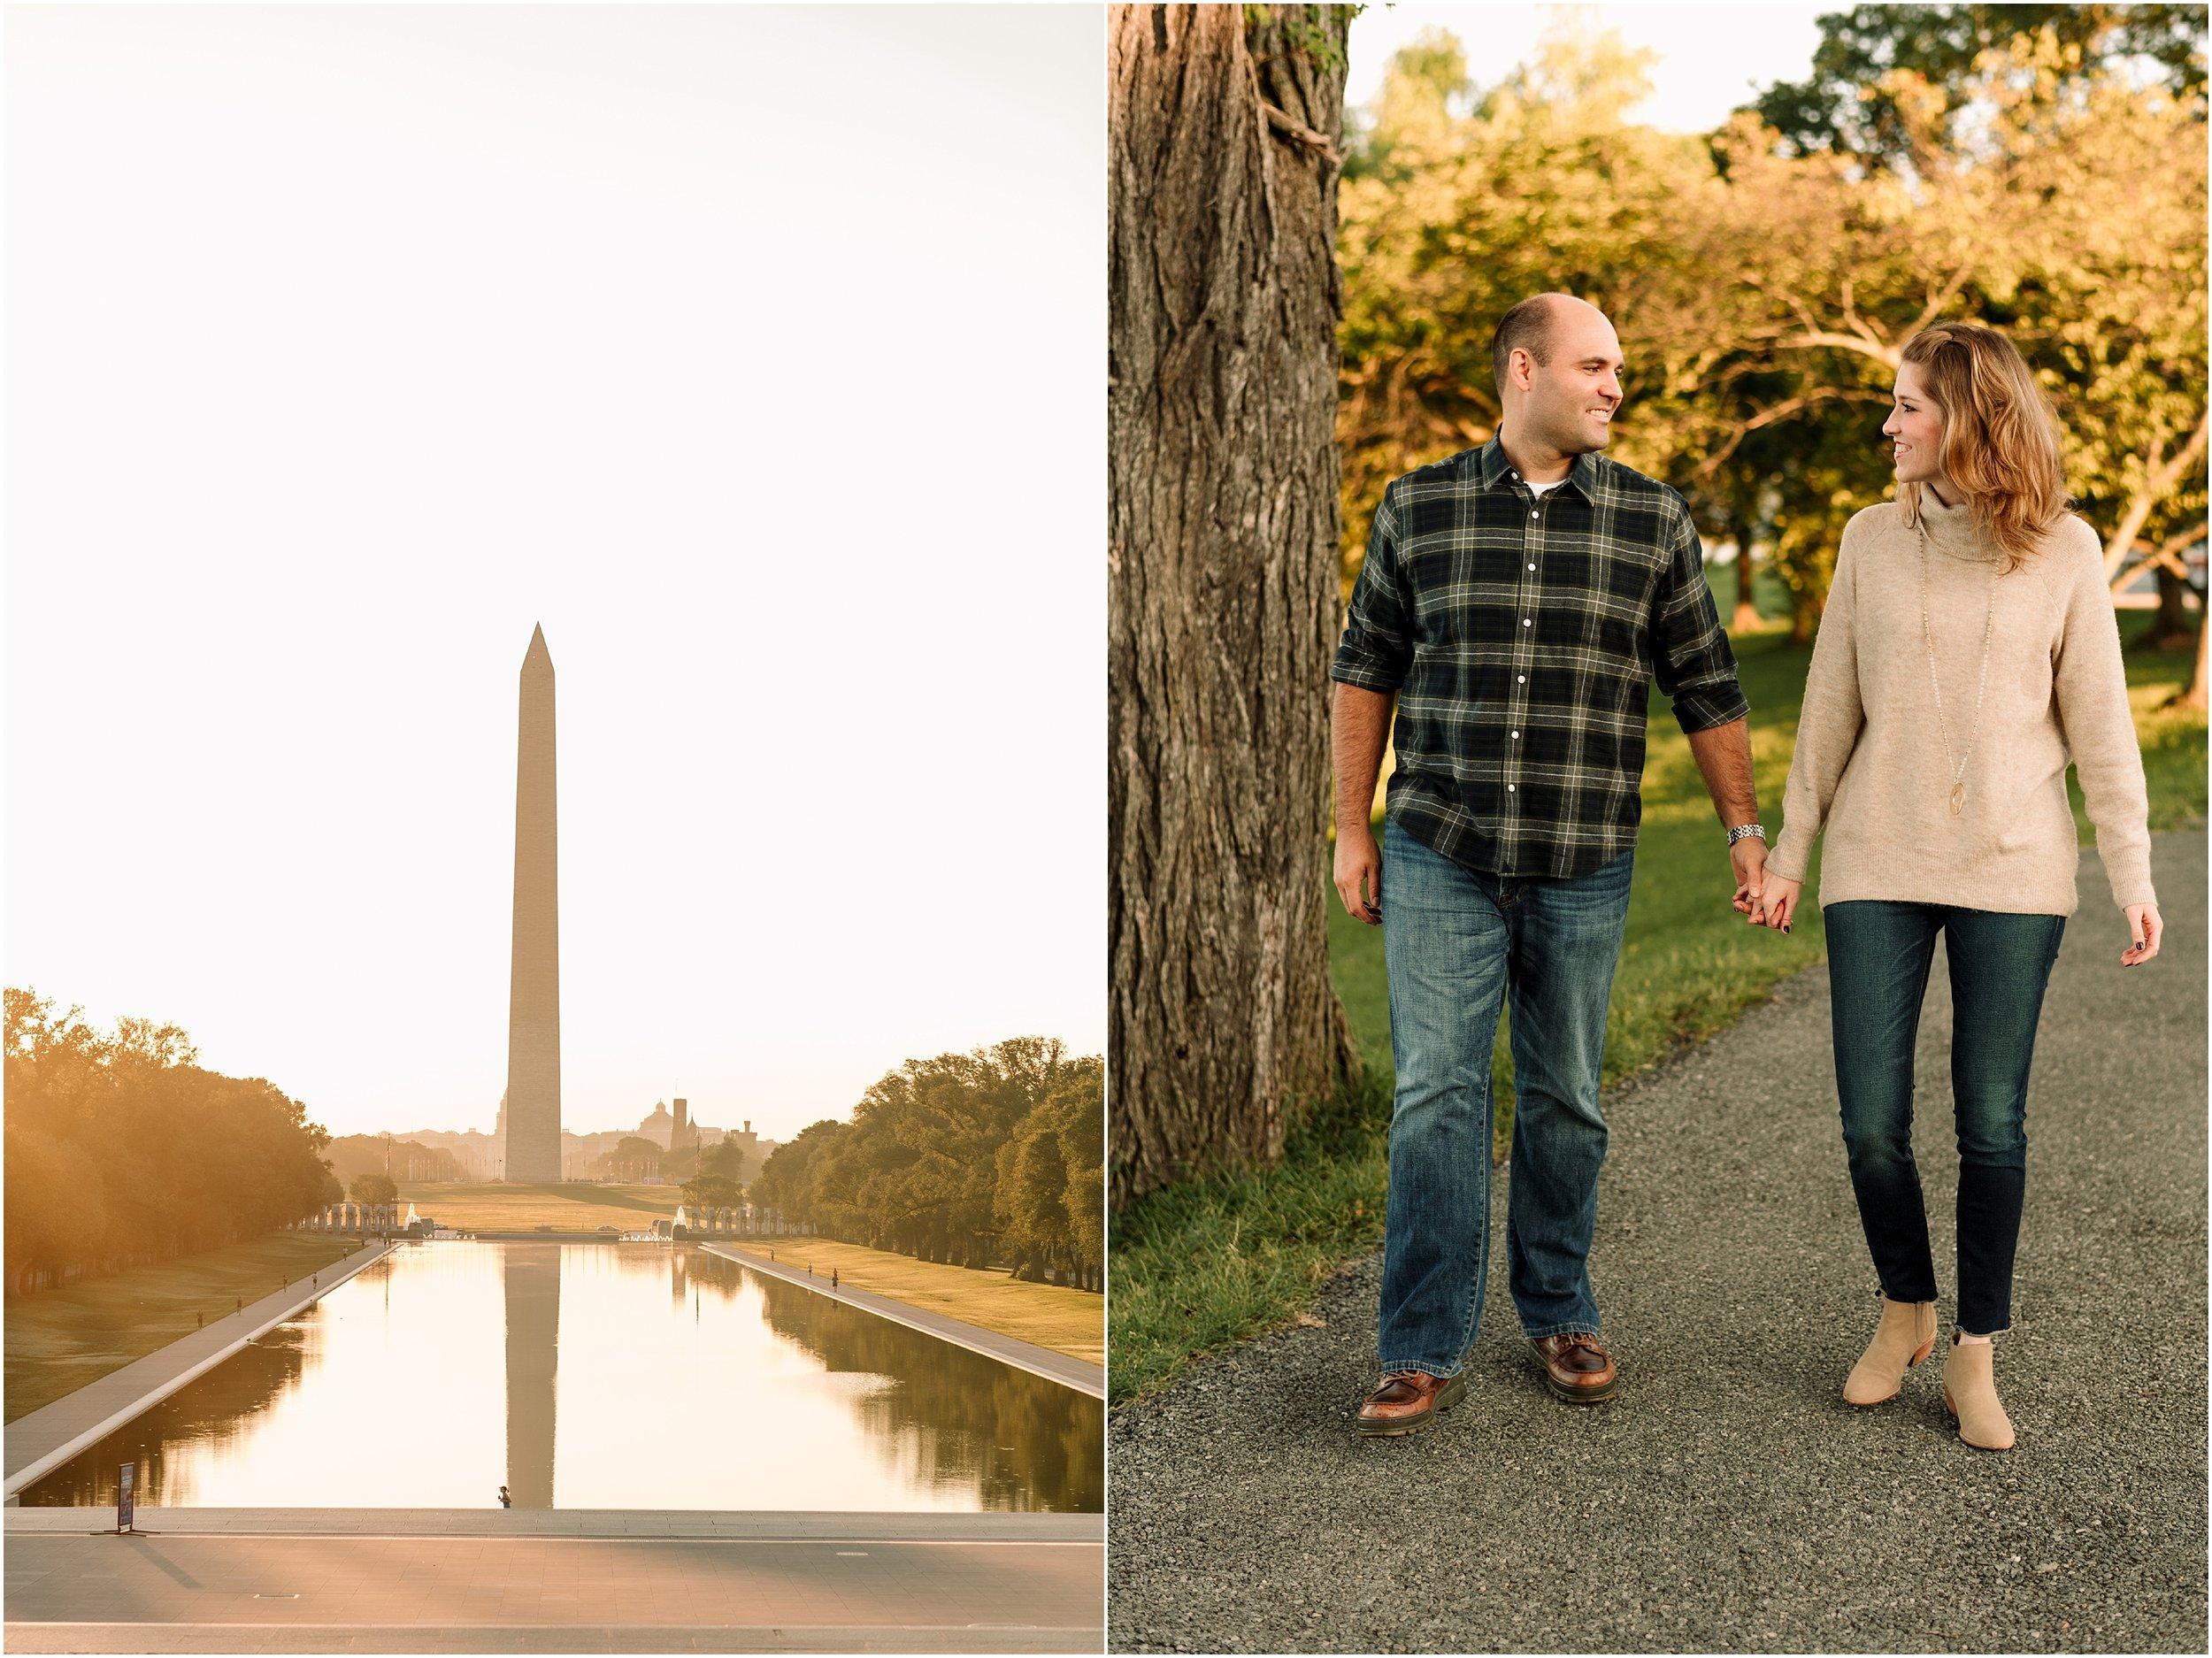 hannah leigh photography Sunrise Jefferson Memorial Engagement Session, Washington DC_1009.jpg